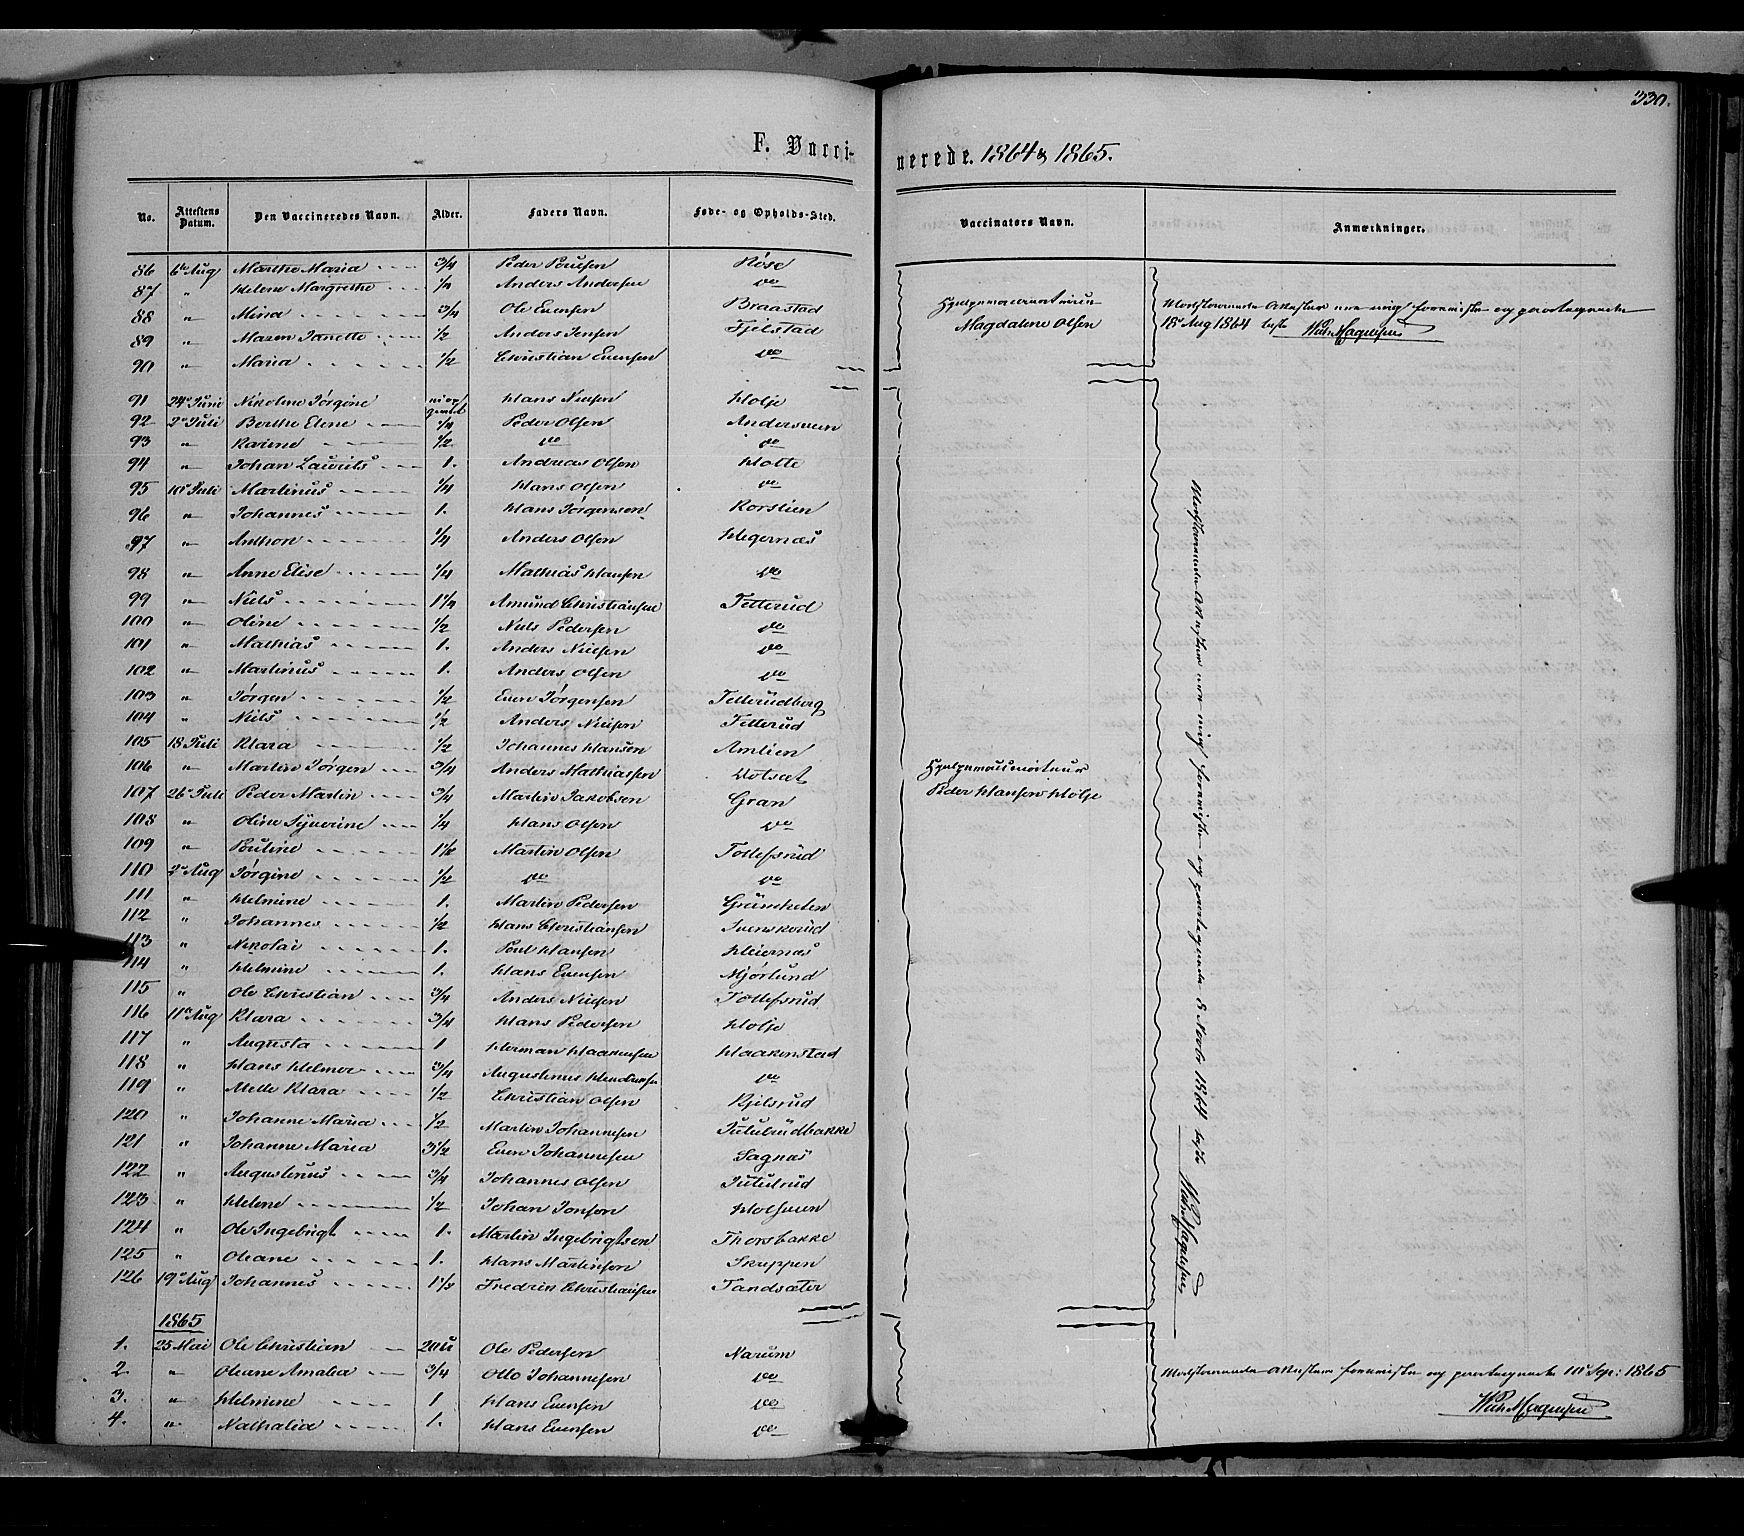 SAH, Vestre Toten prestekontor, H/Ha/Haa/L0007: Ministerialbok nr. 7, 1862-1869, s. 330